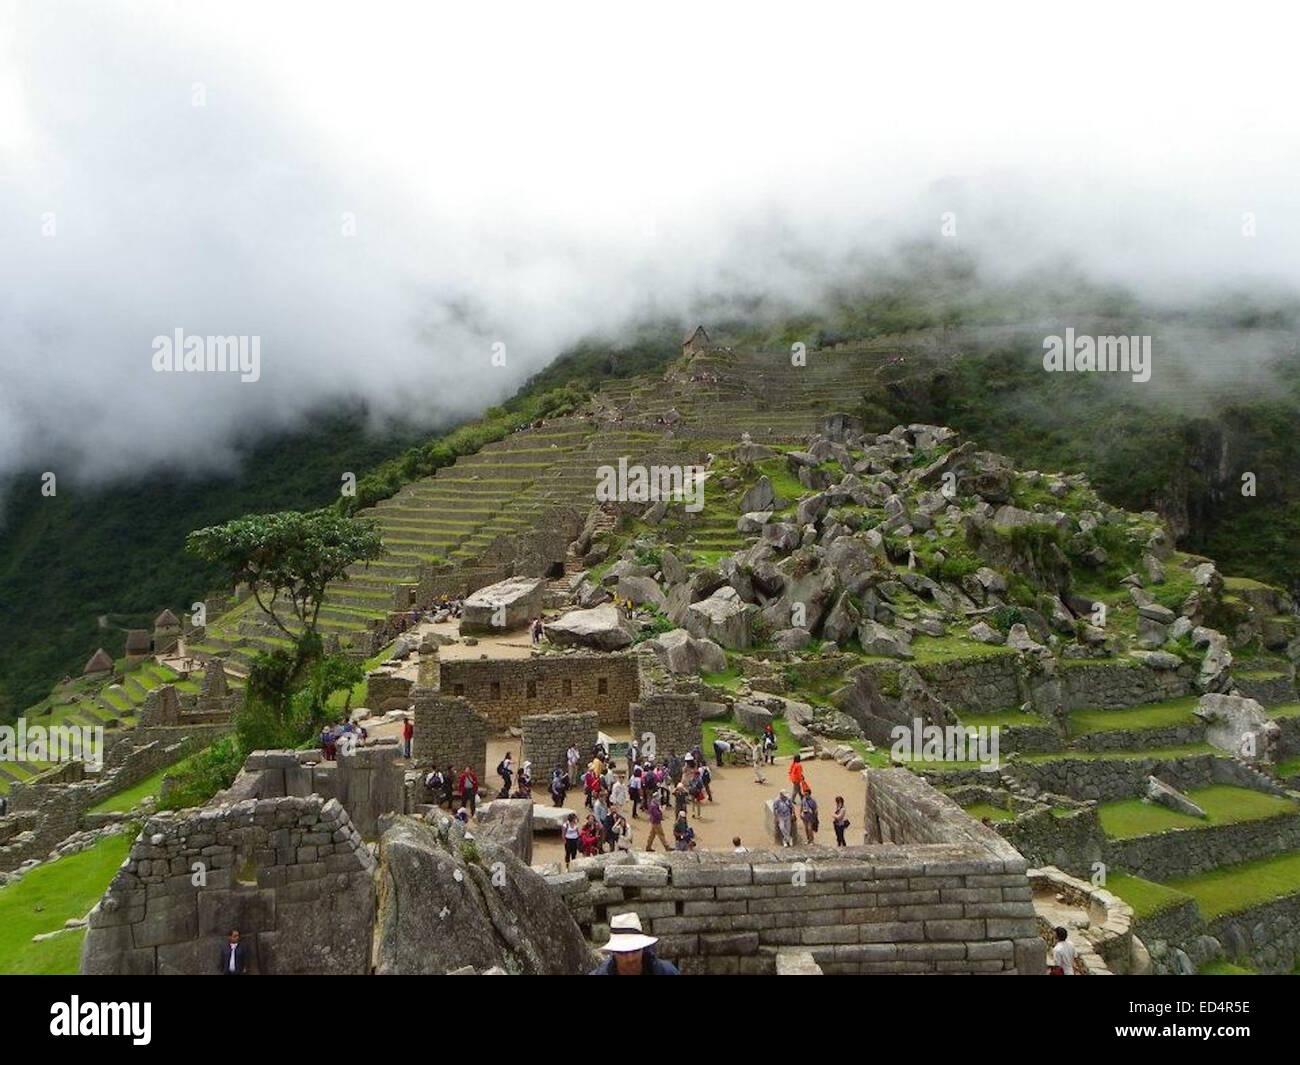 Mountain living near cusco peru royalty free stock photo - Incan Stone Buildings And Terraces At Machu Picchu Cusco Peru